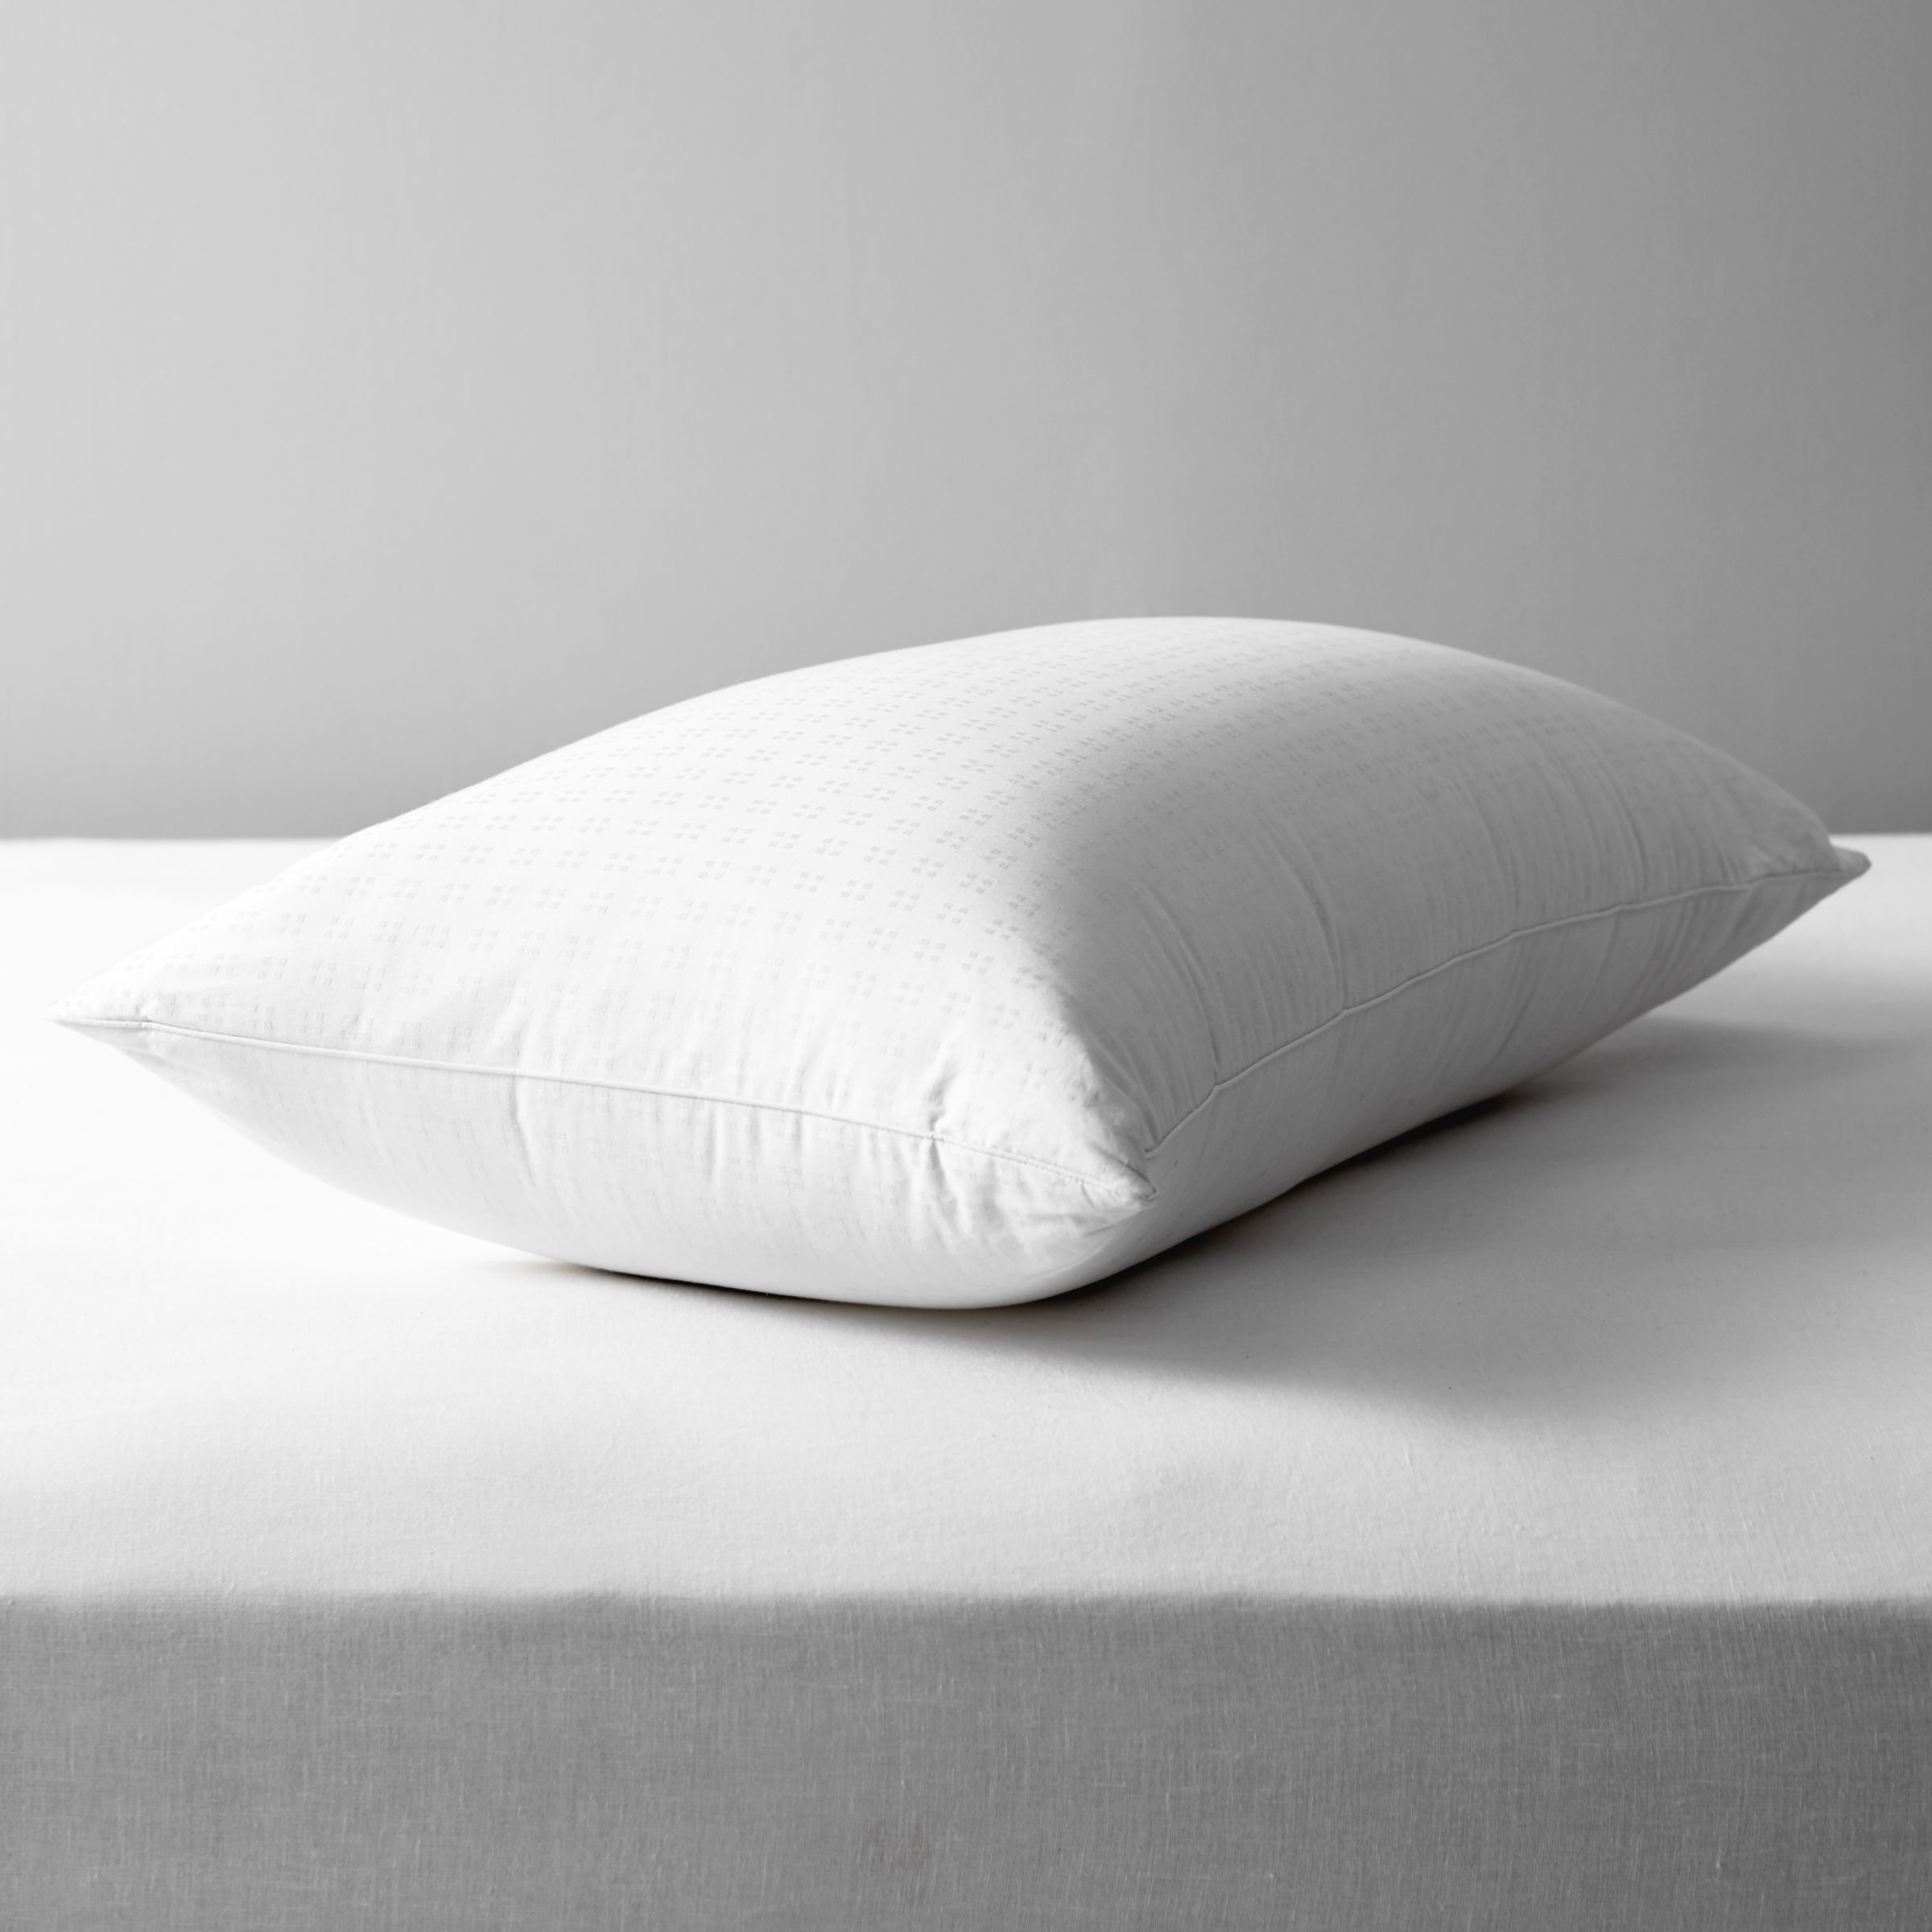 John Lewis & Partners Natural Collection Siberian Goose Down Standard Pillow, Soft